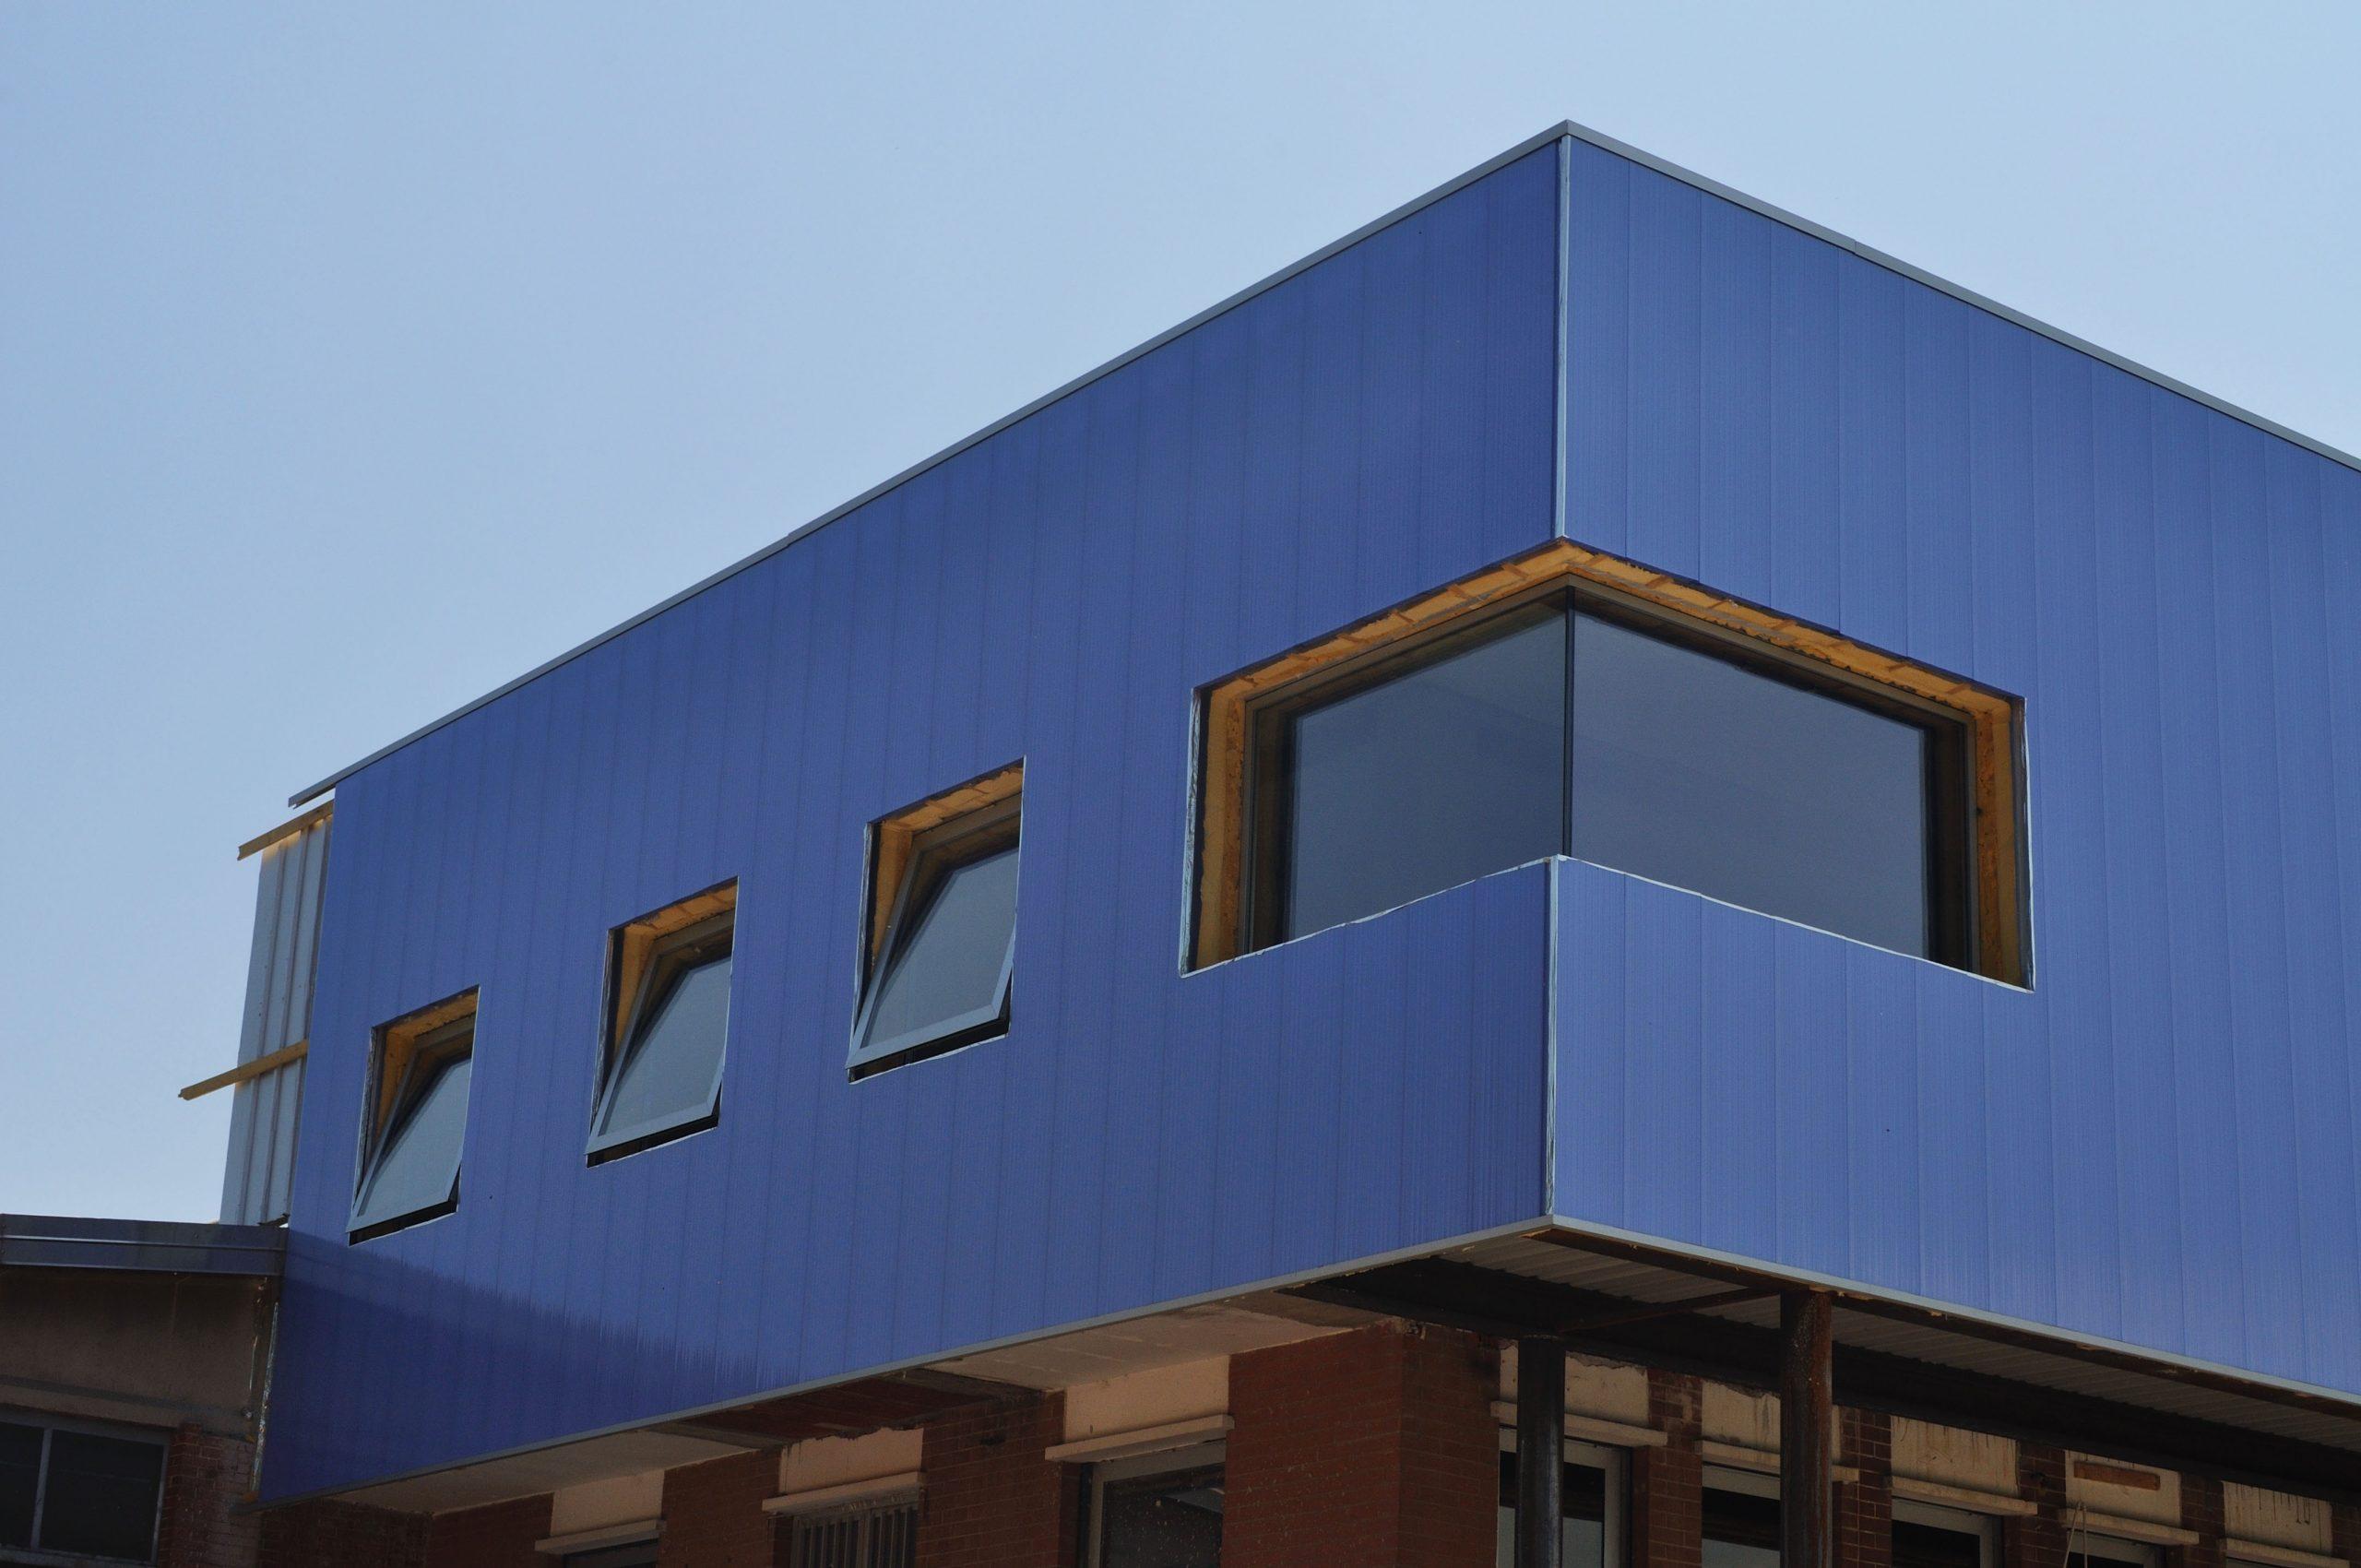 isolanti-per-facciata-ventilata-05